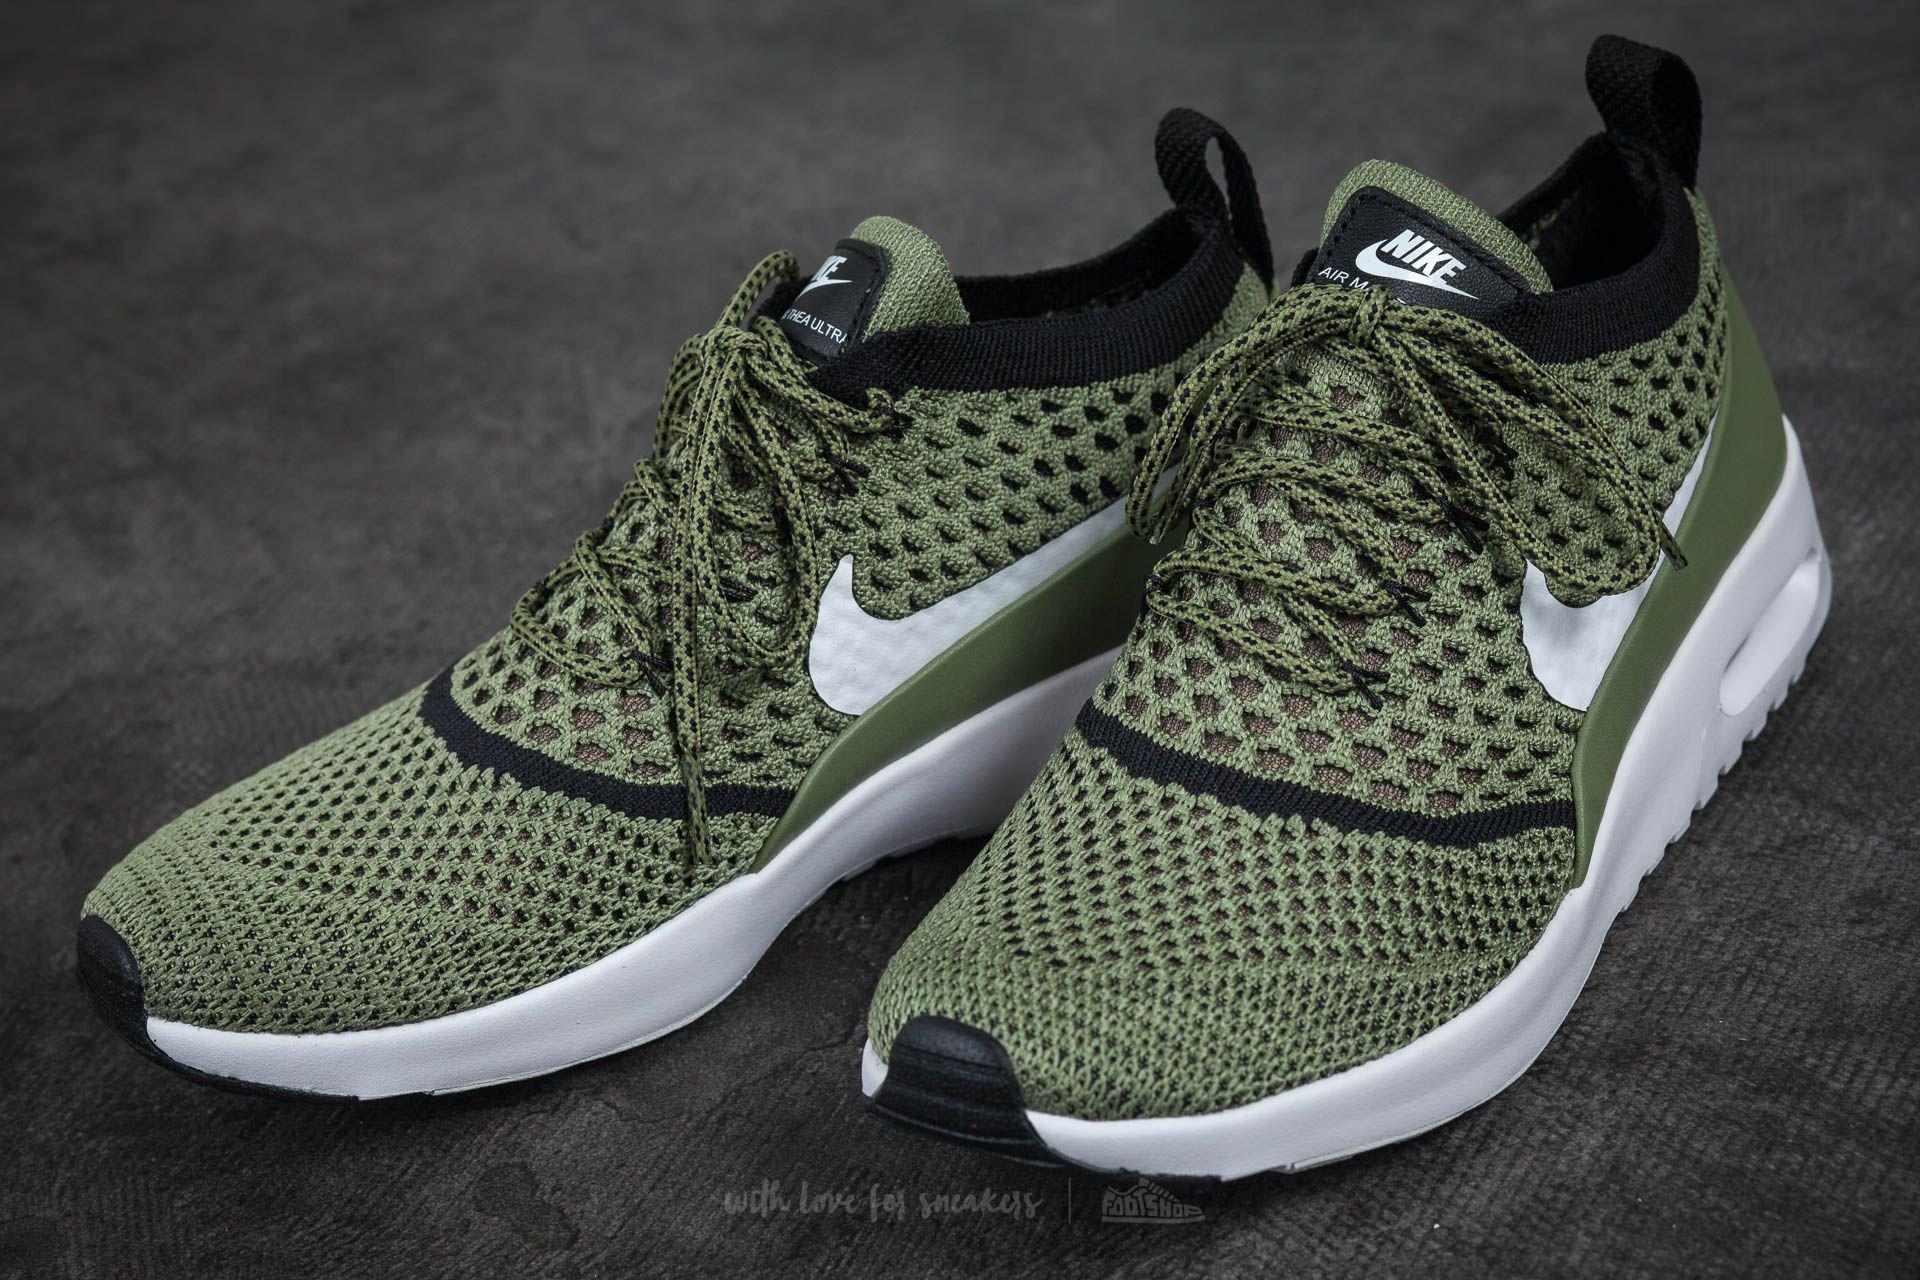 Nike Wmns Air Max Thea Ultra Flyknit Palm Green White black